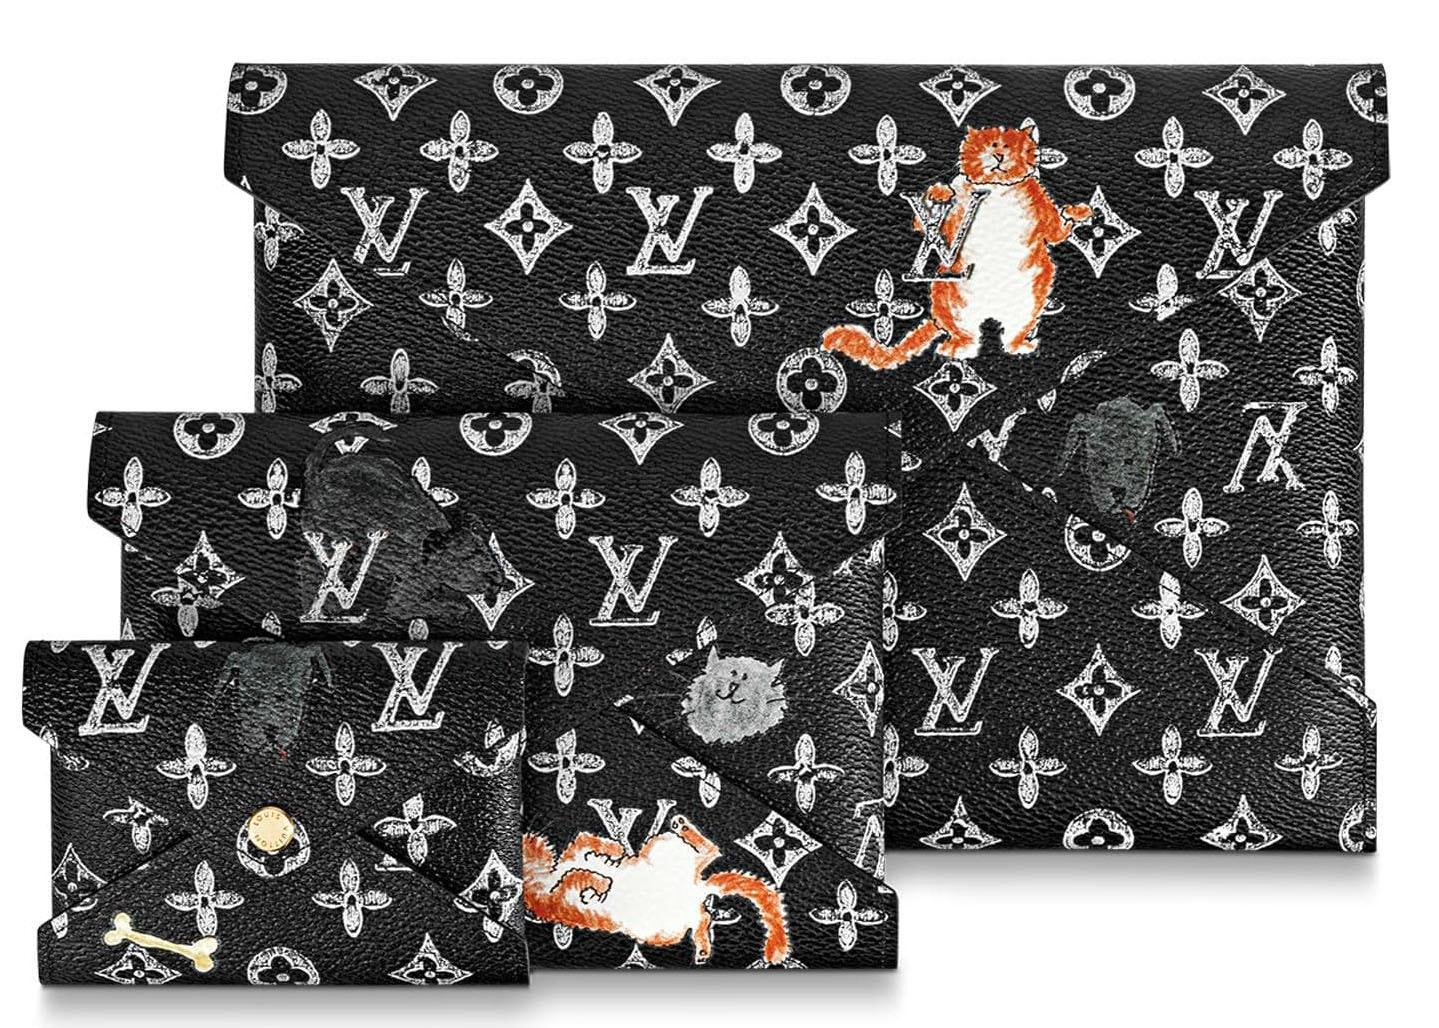 Louis Vuitton Pochette Kirigami Monogram Catogram Black/White